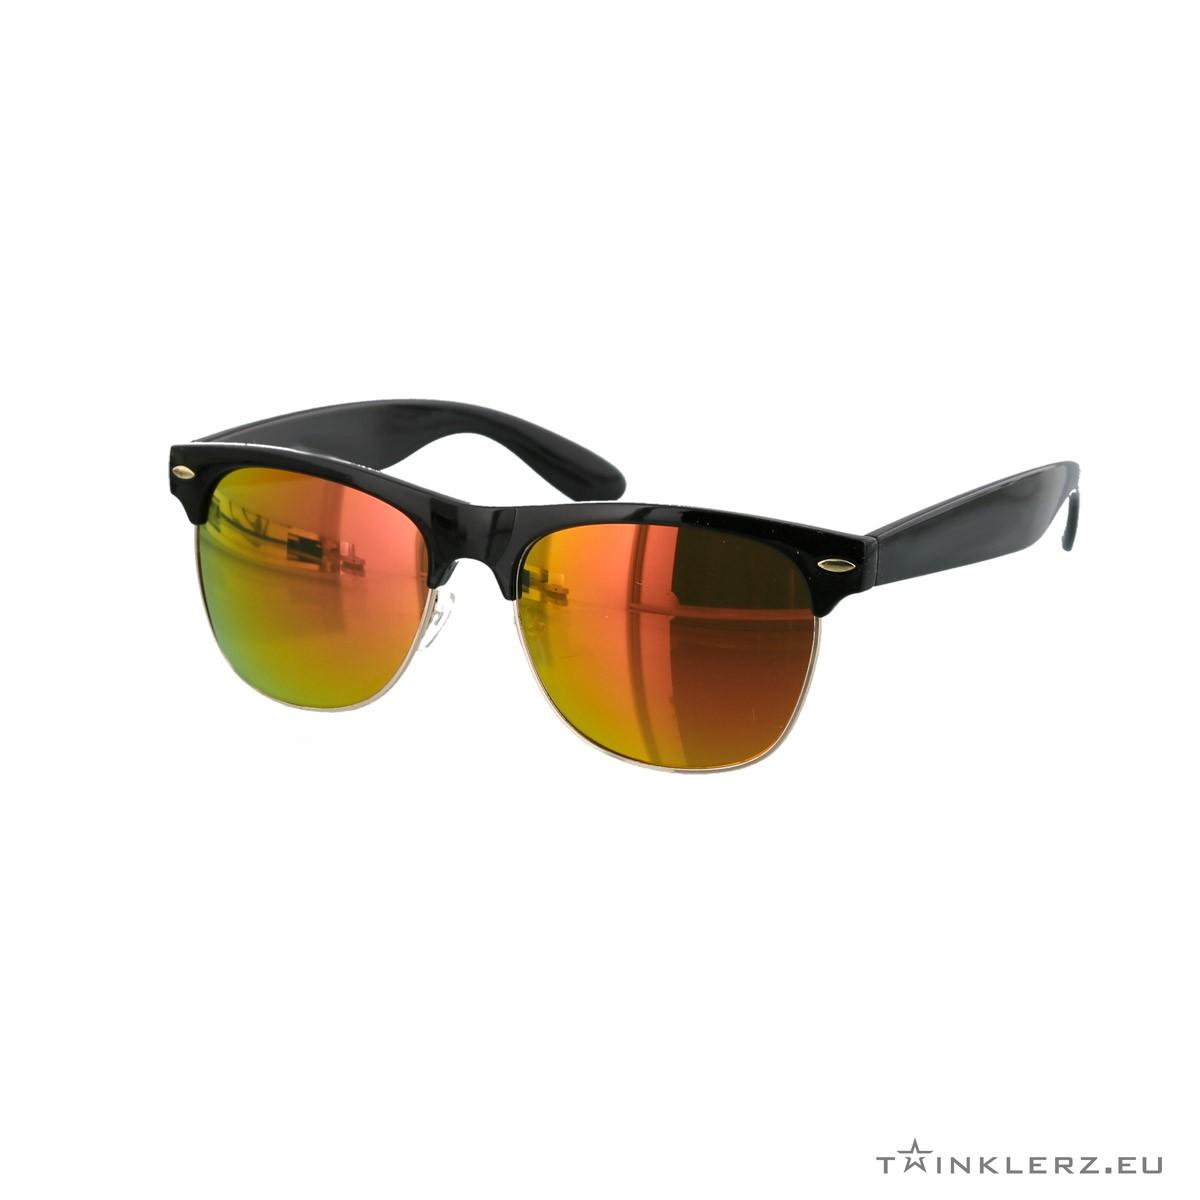 Black clubmaster modern sunglasses red orange mirrored lenses